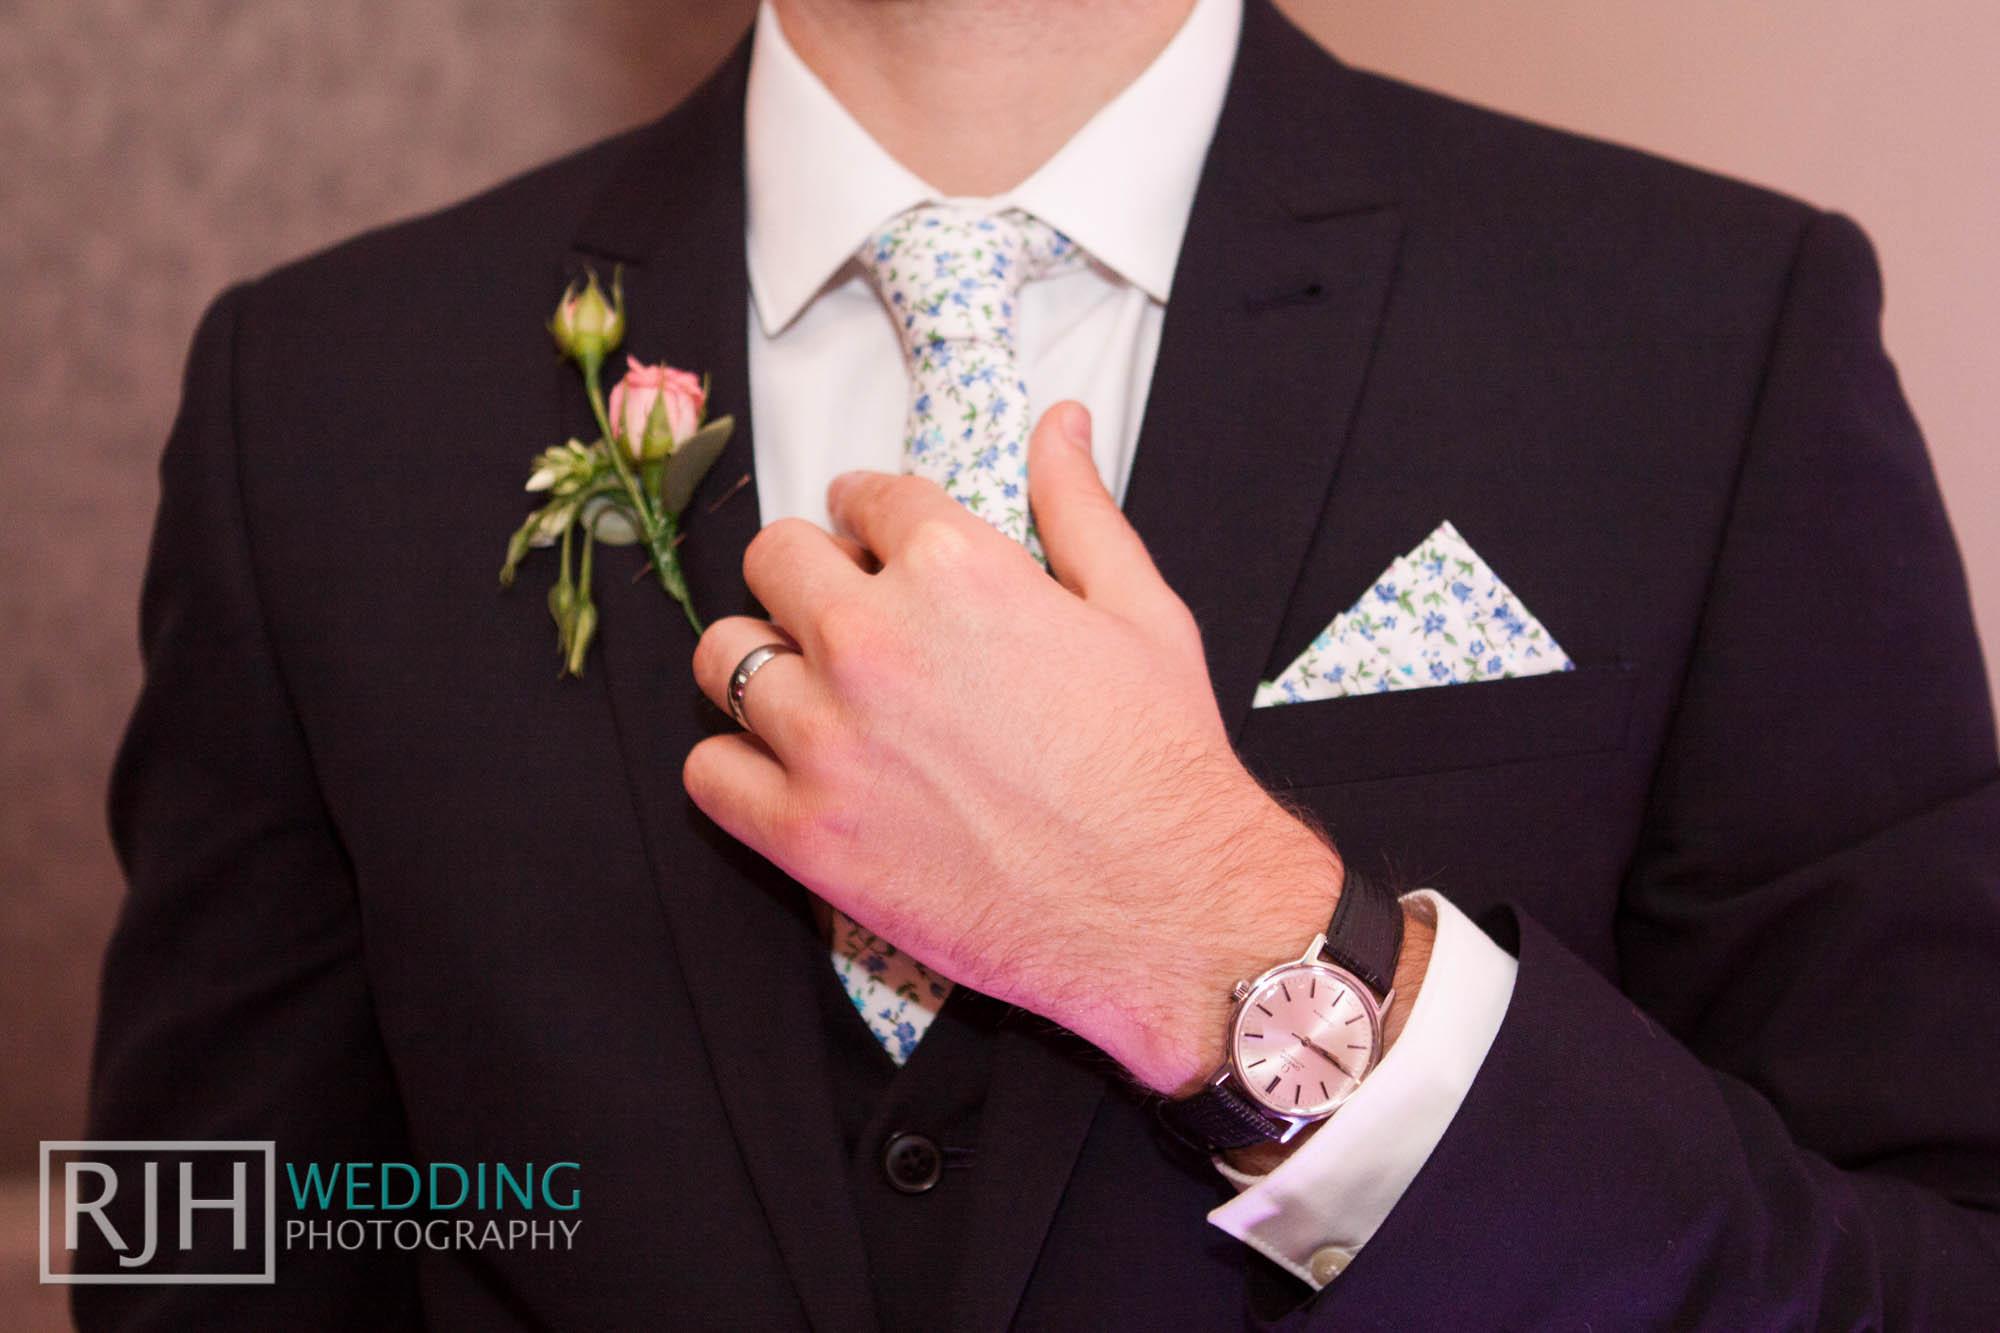 RJH Wedding Photography_Tankersley Manor Wedding_39.jpg